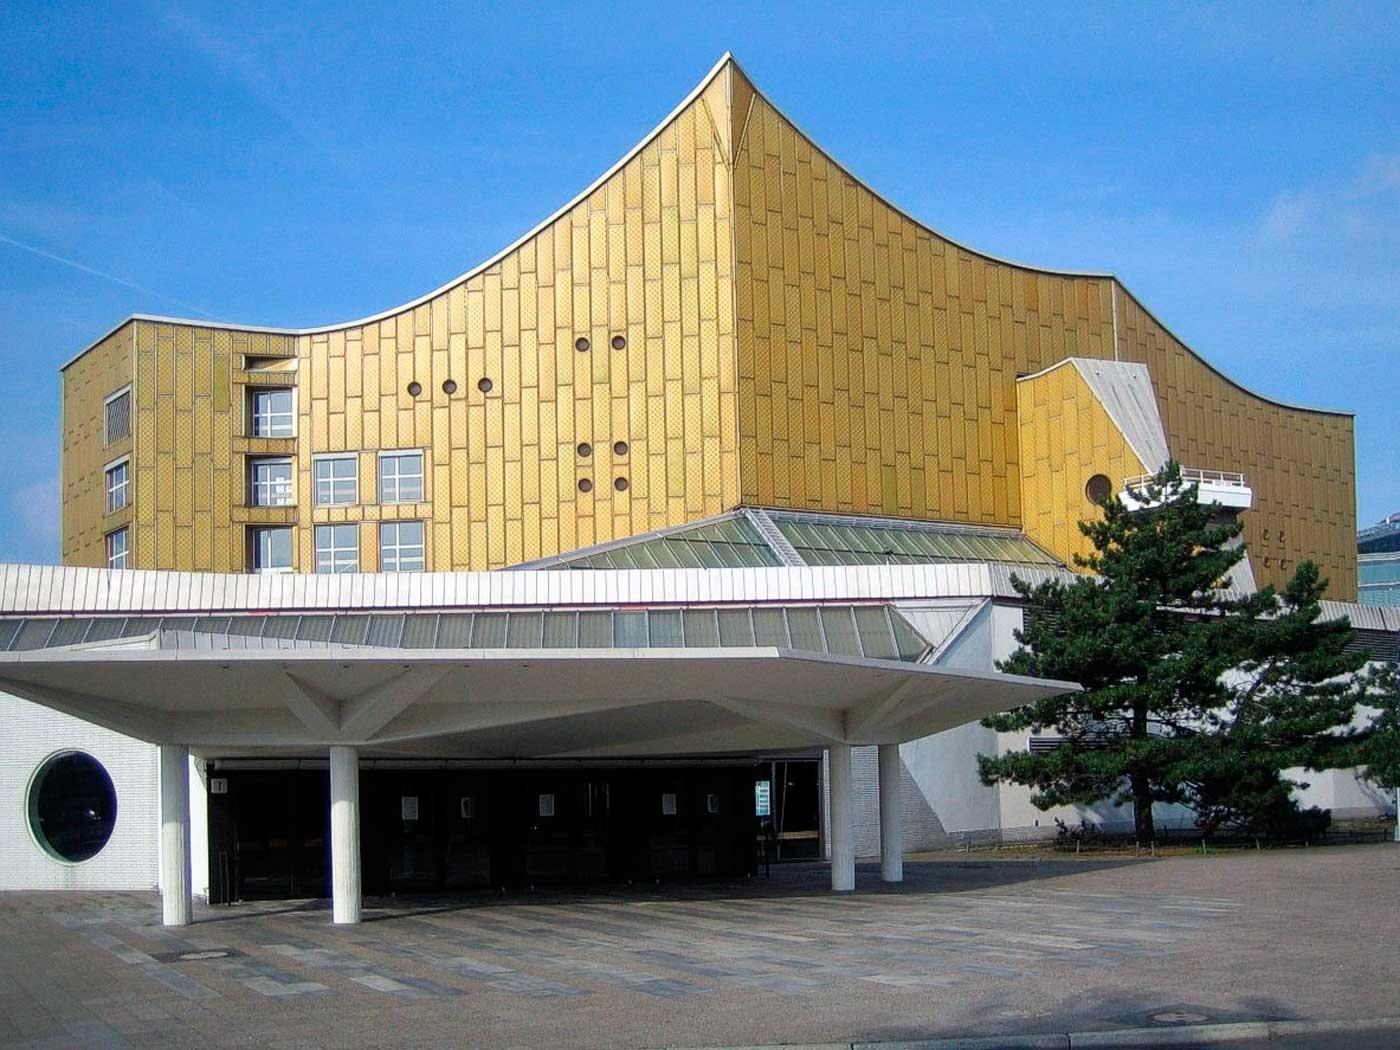 El pent gono dorado m sica inesperada blogs for Exterior edificios